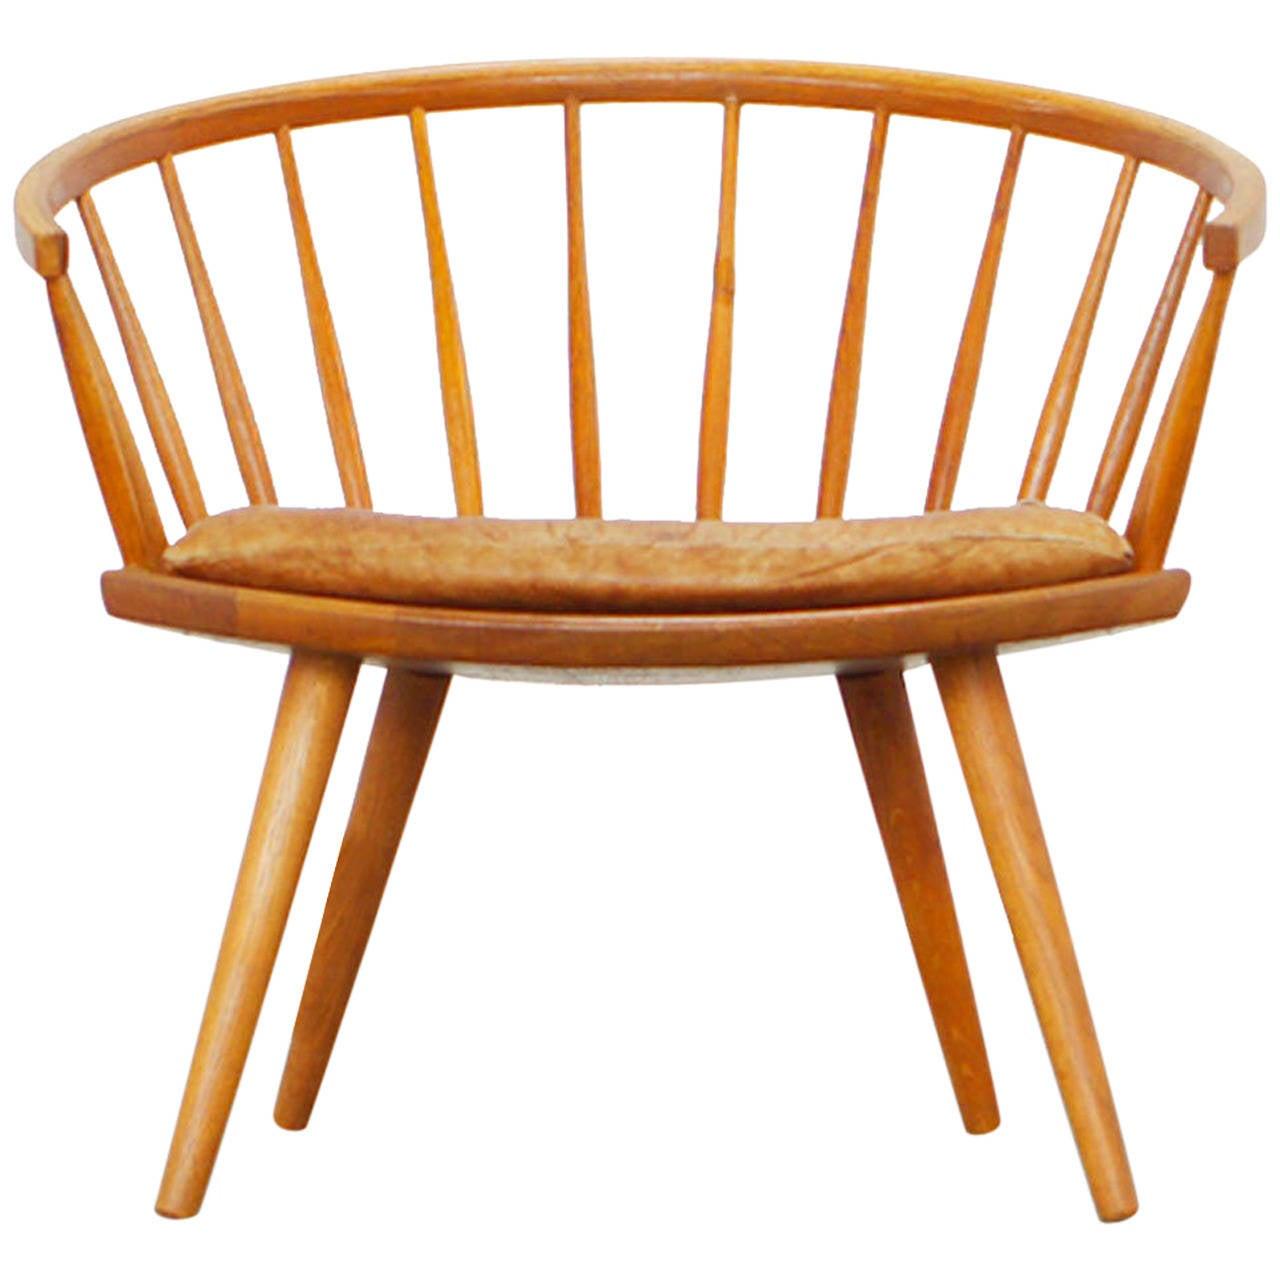 swedish high chair covers rentals online yngve ekström arka maple mid century modern